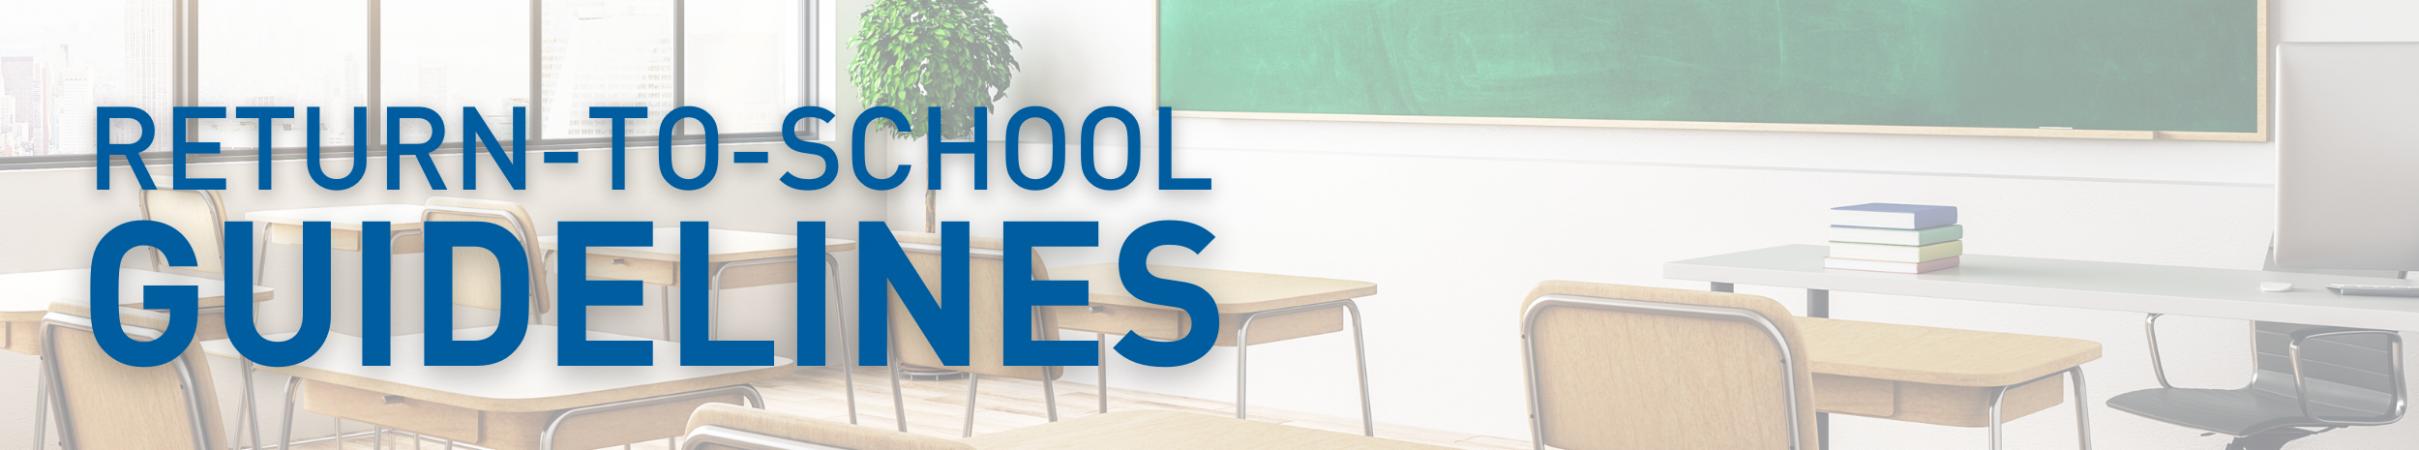 Return-to-school Guidelines slider